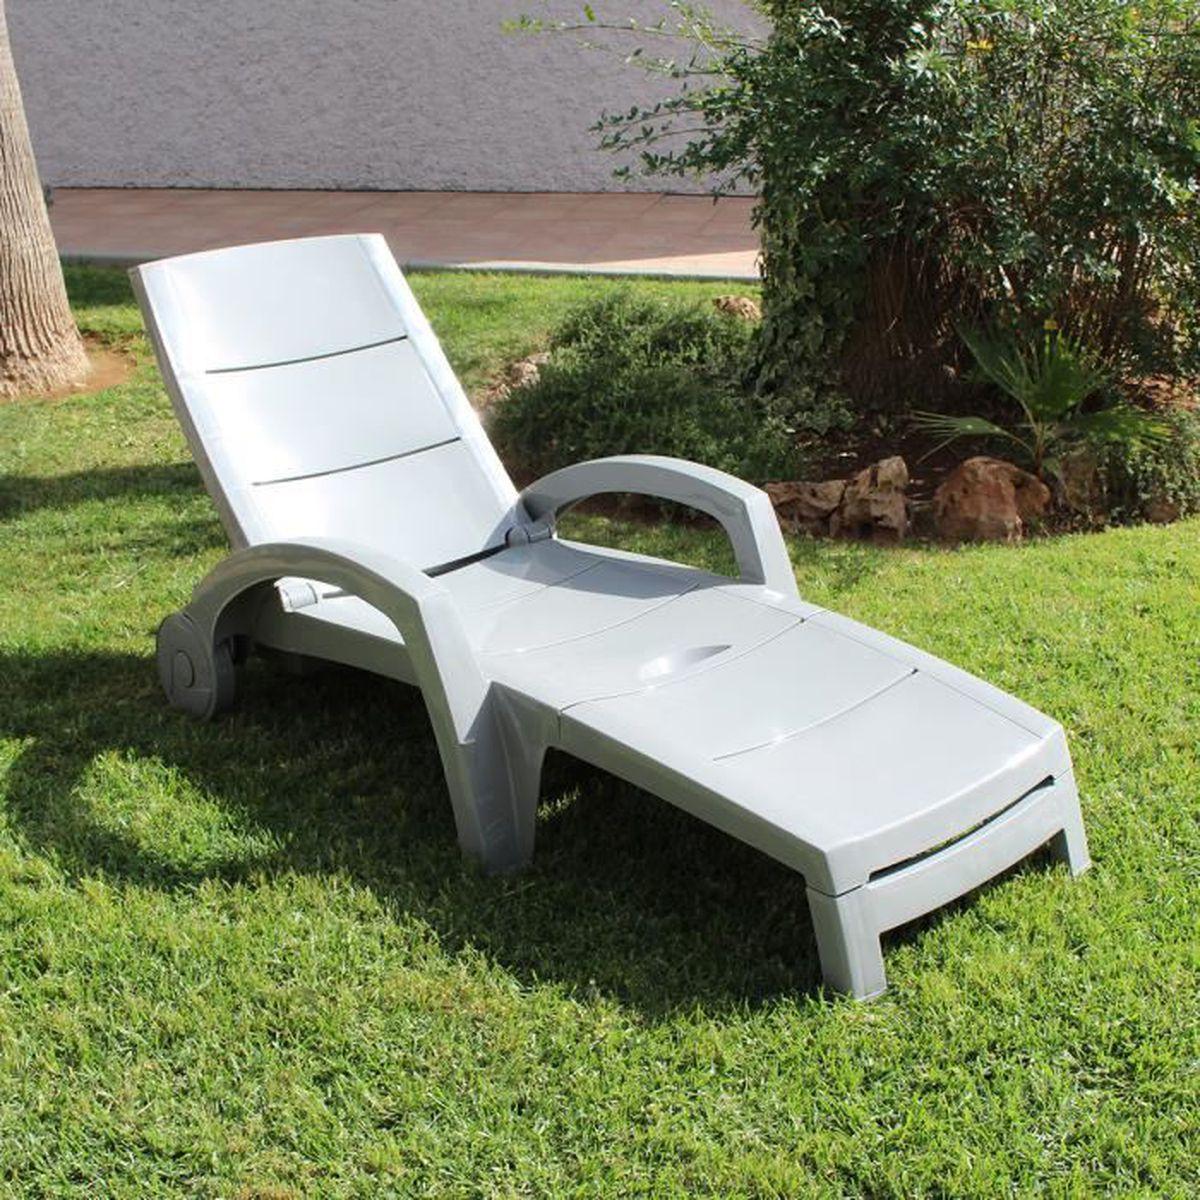 Bain de soleil oc an gris clair anthracite achat vente for Chaise longue bain de soleil